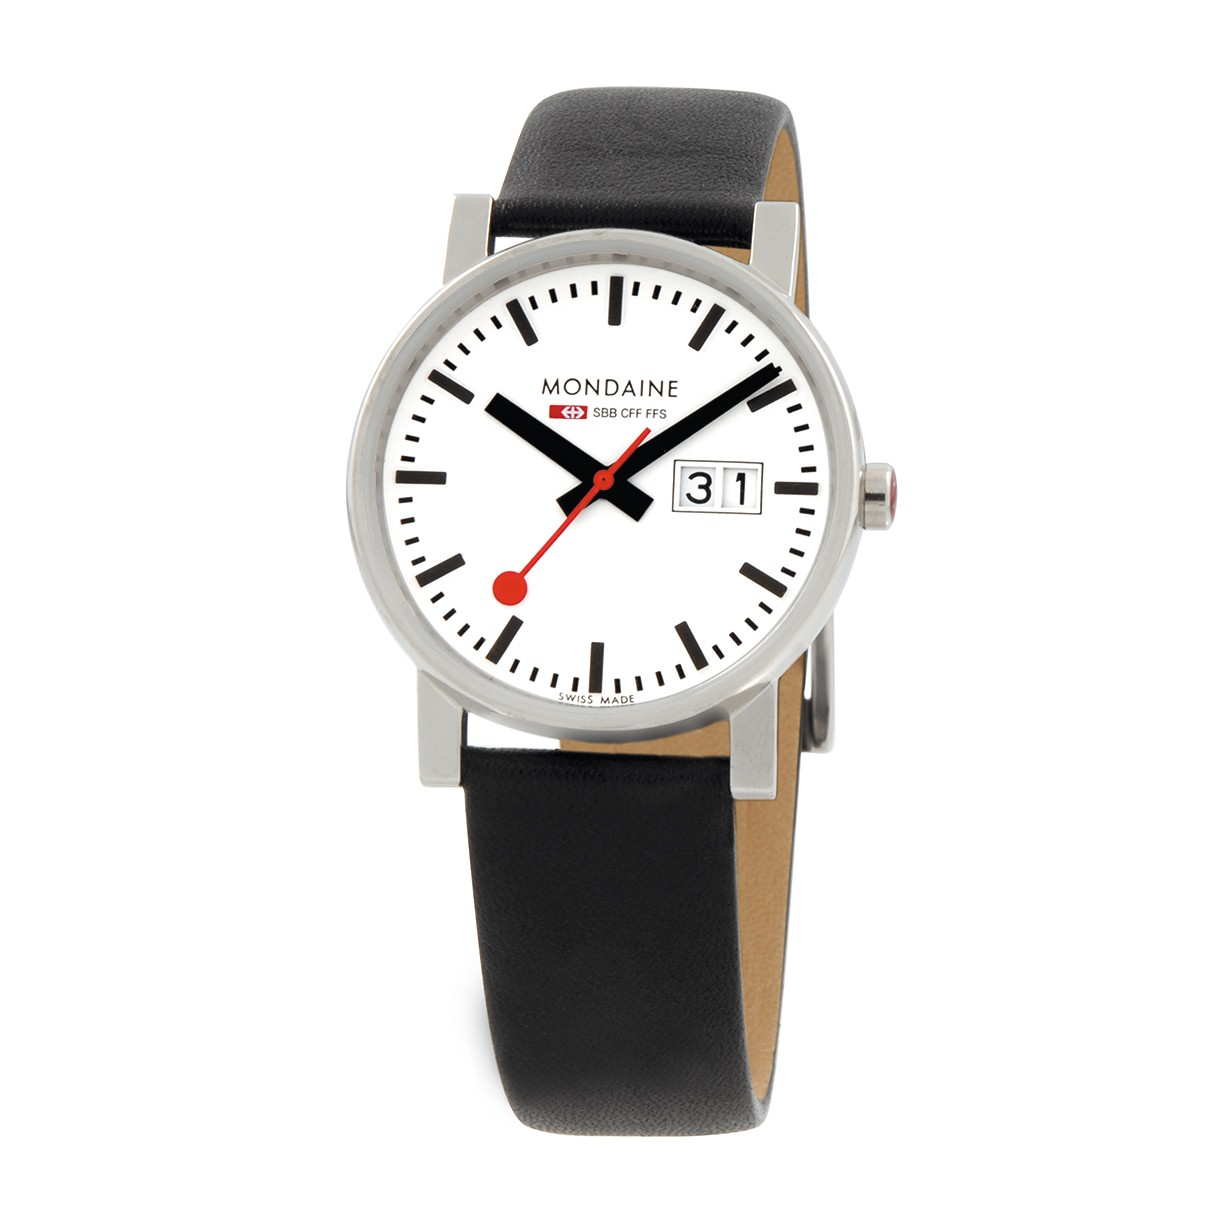 Mondaine swiss watch EVO GENTS BIG DATE - A669.30300.11SBB